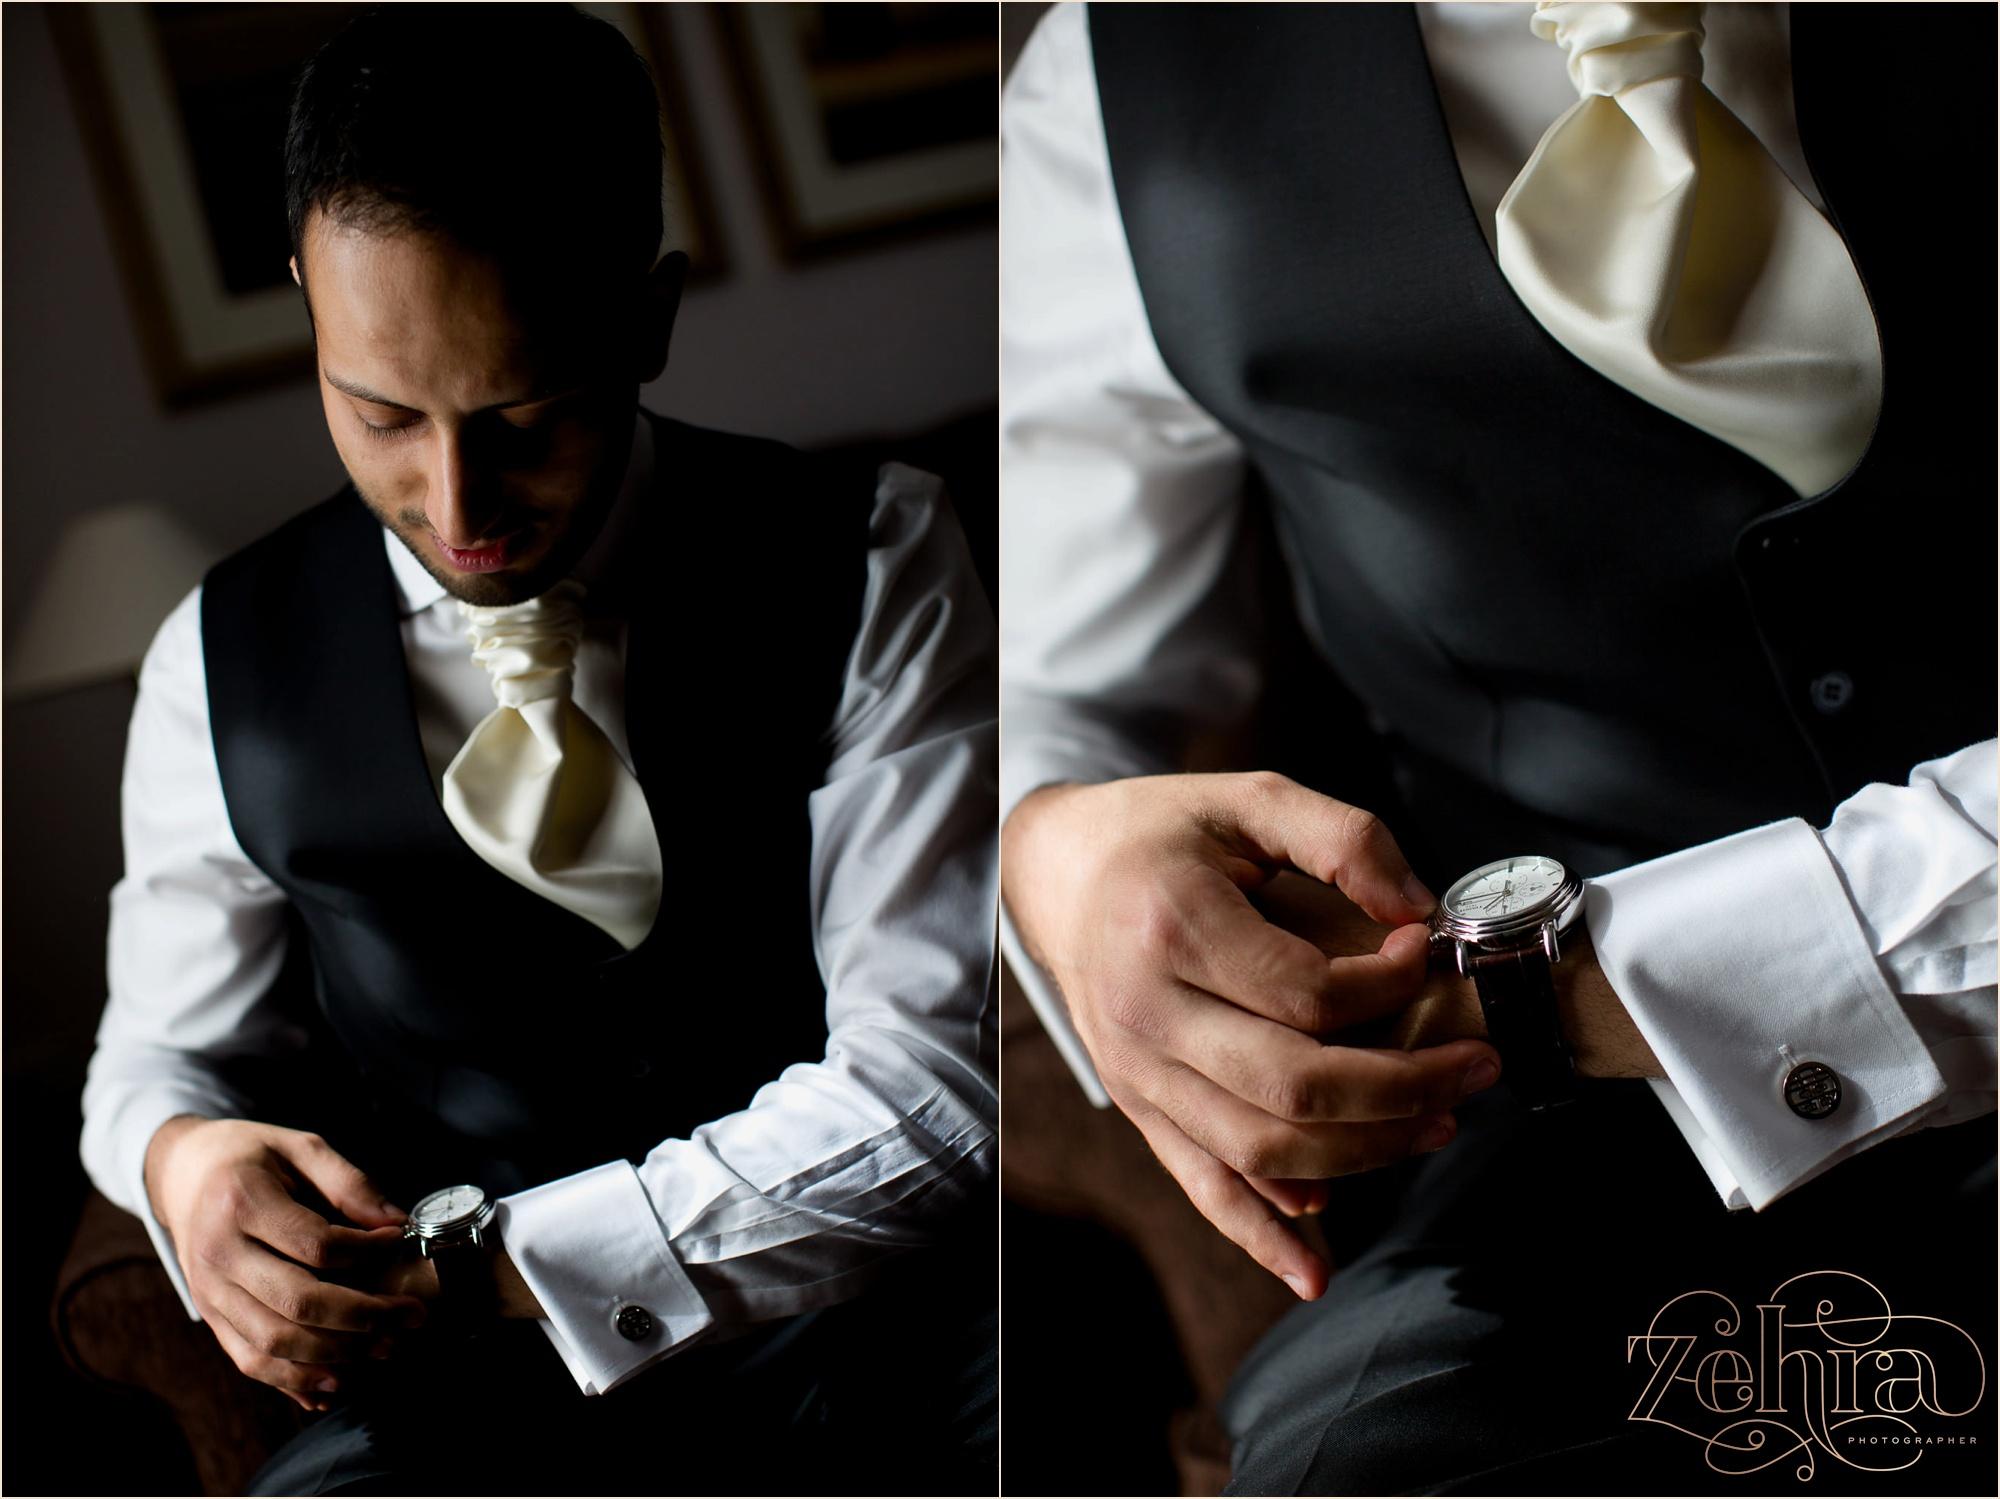 jasira manchester wedding photographer_0063.jpg